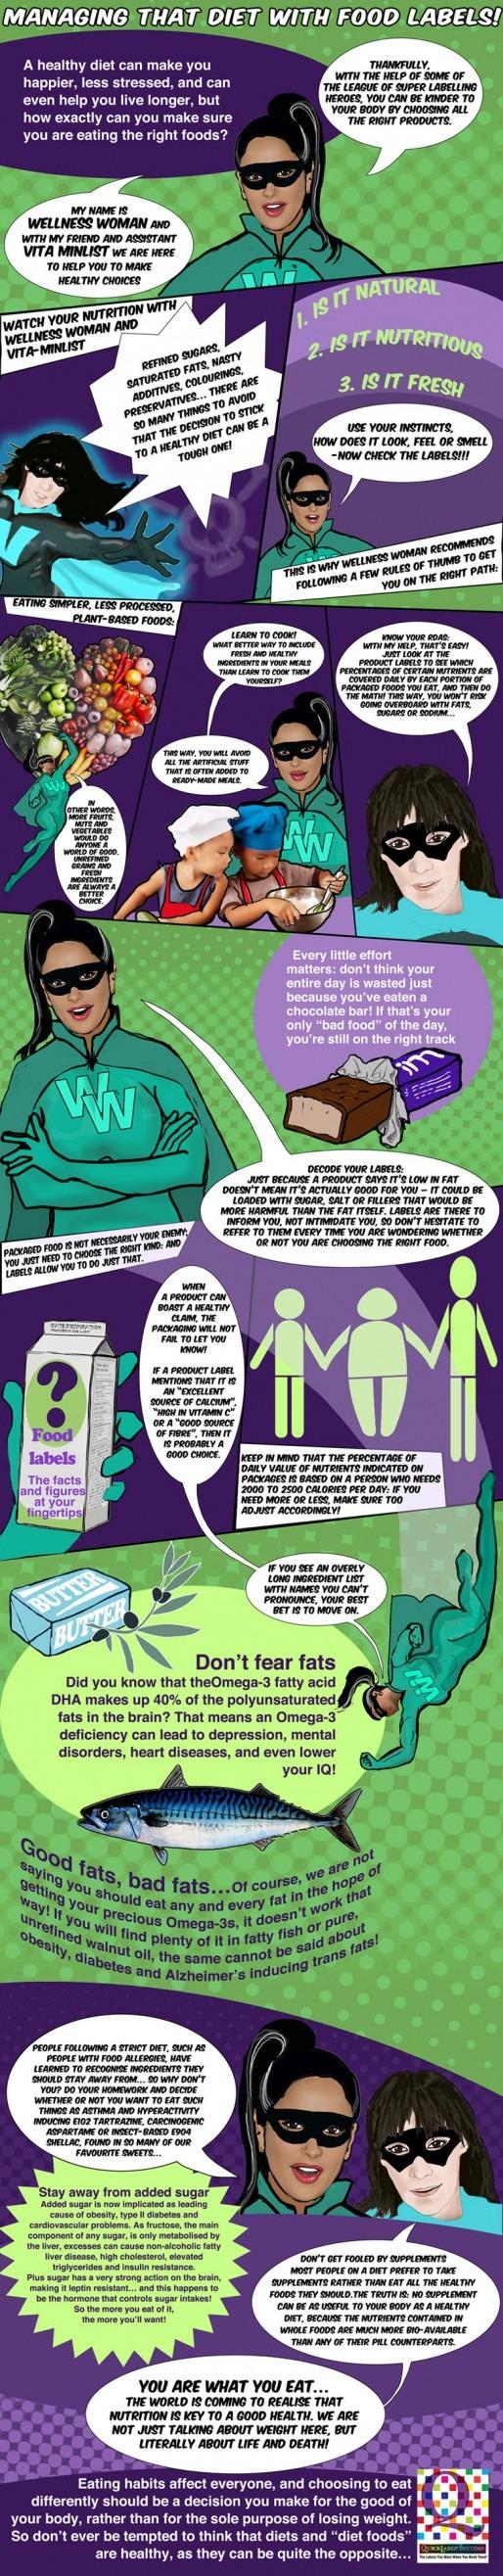 Super heroes explain labels - marketing infographic